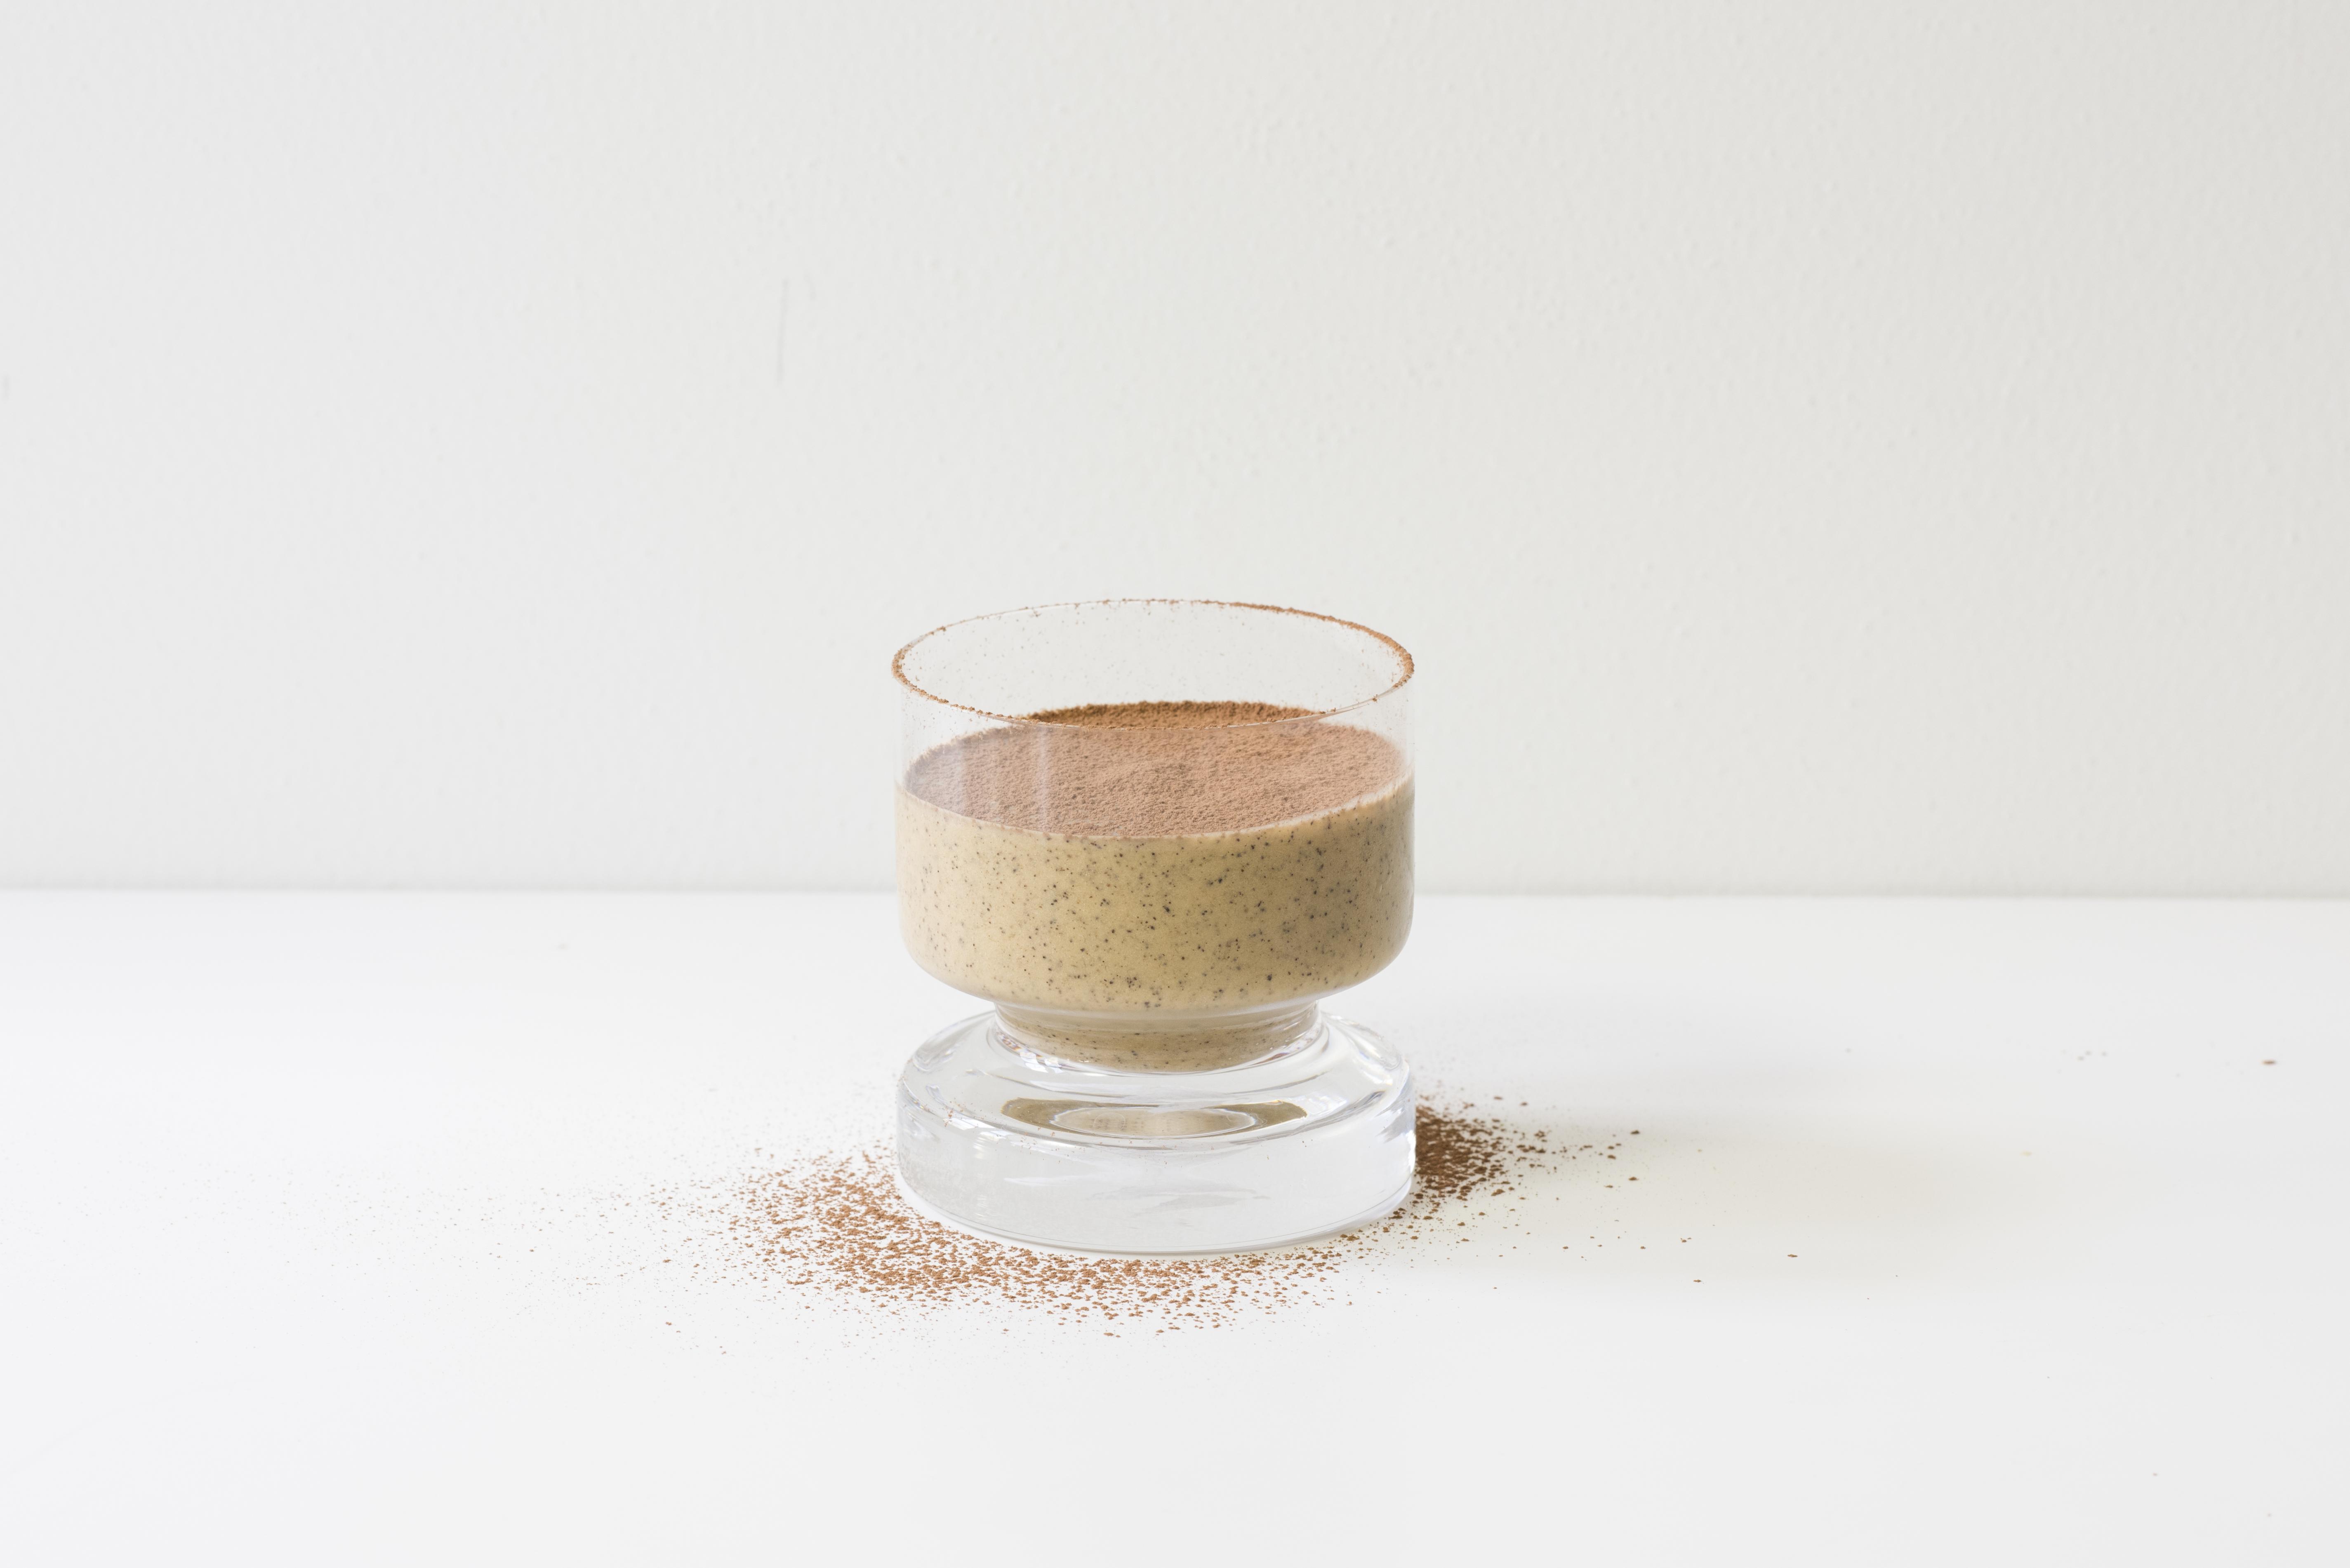 Chickpea 'Peanut' Butter Espresso Smoothie